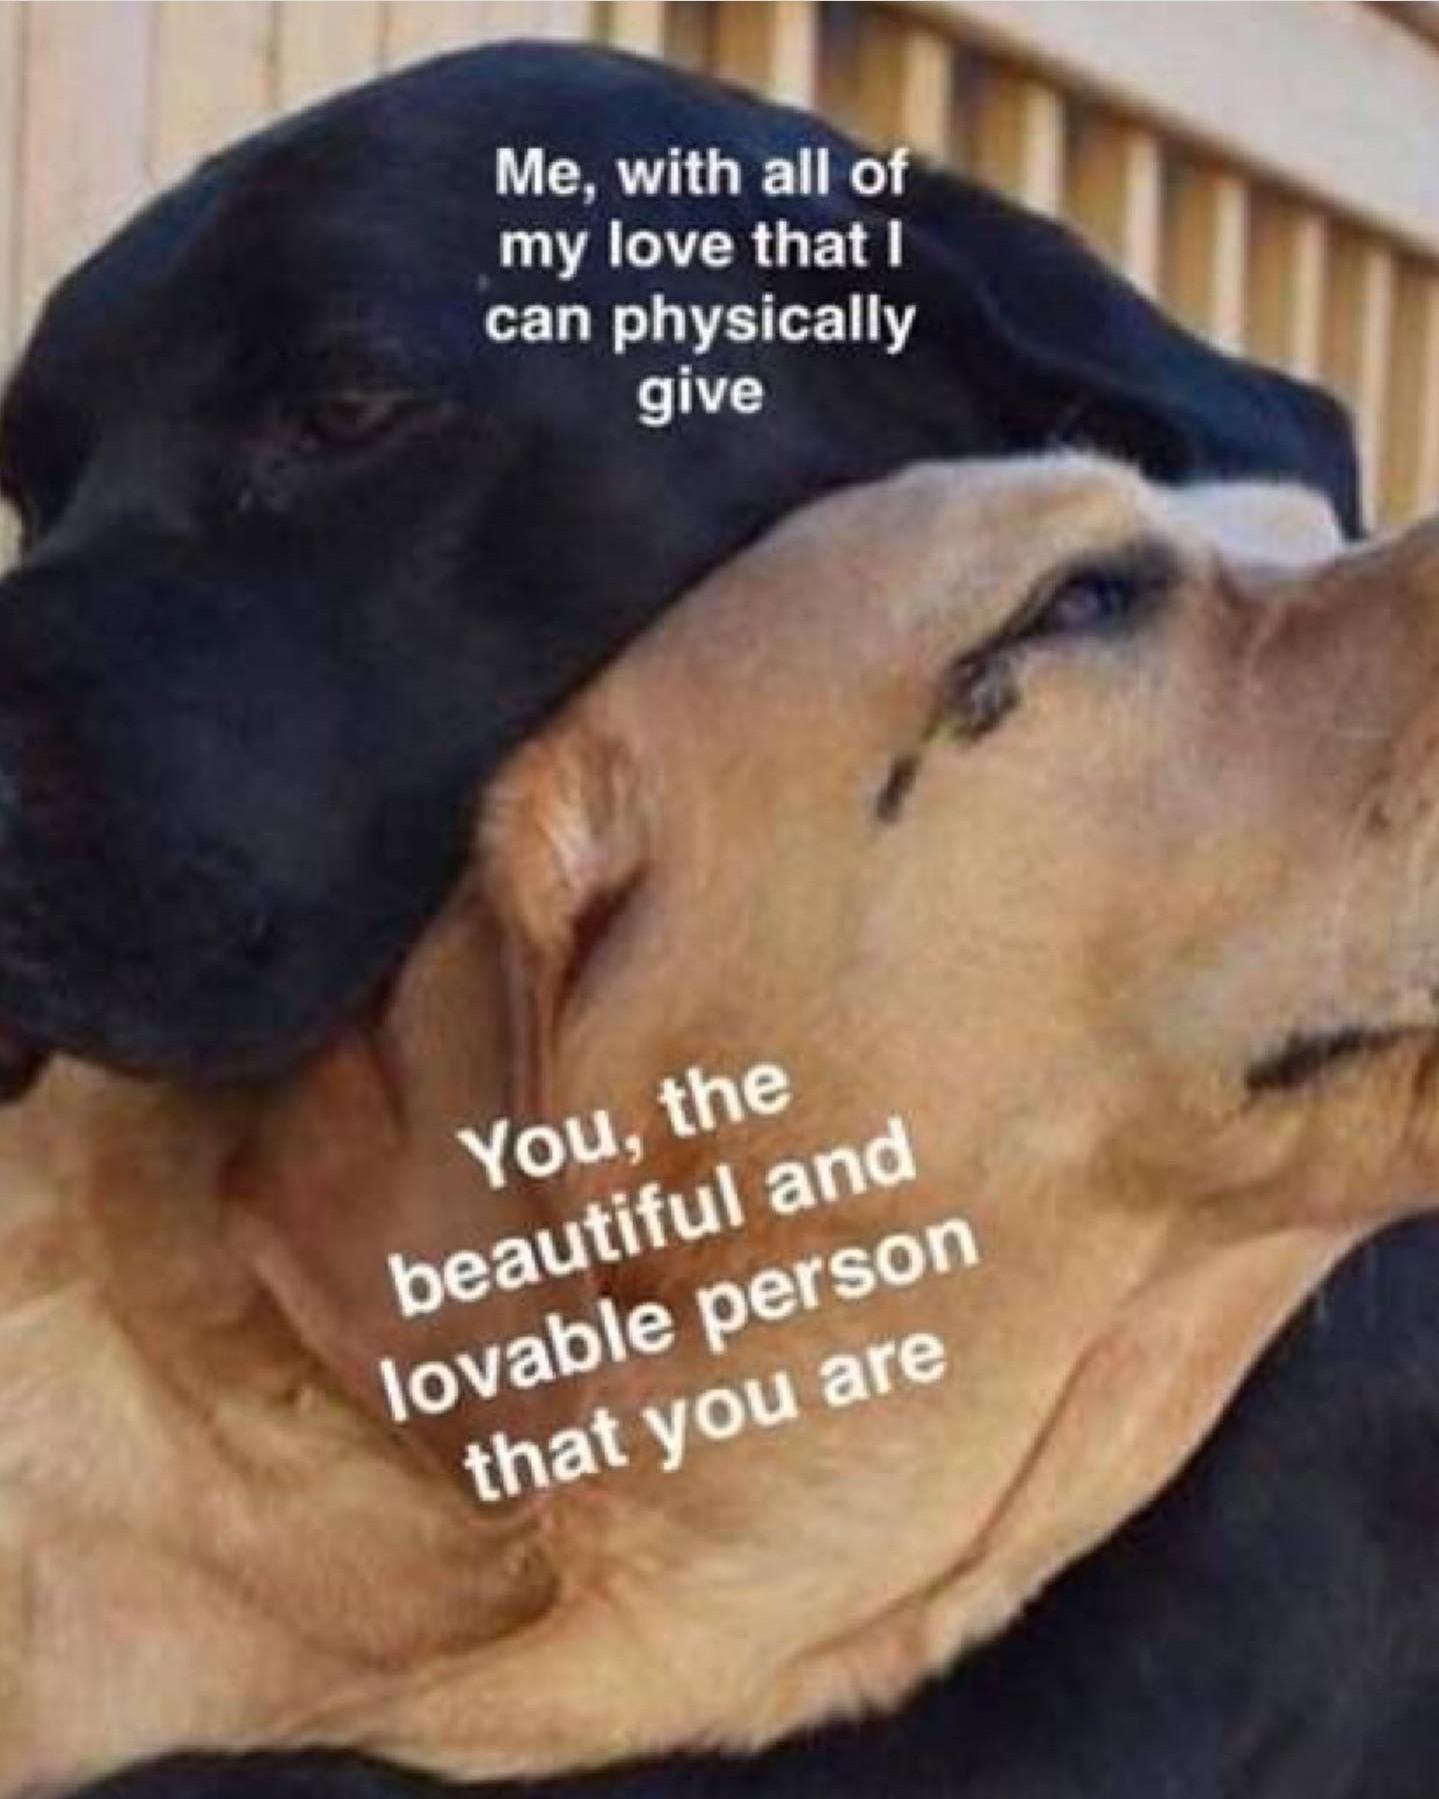 You are beautiful :) - meme